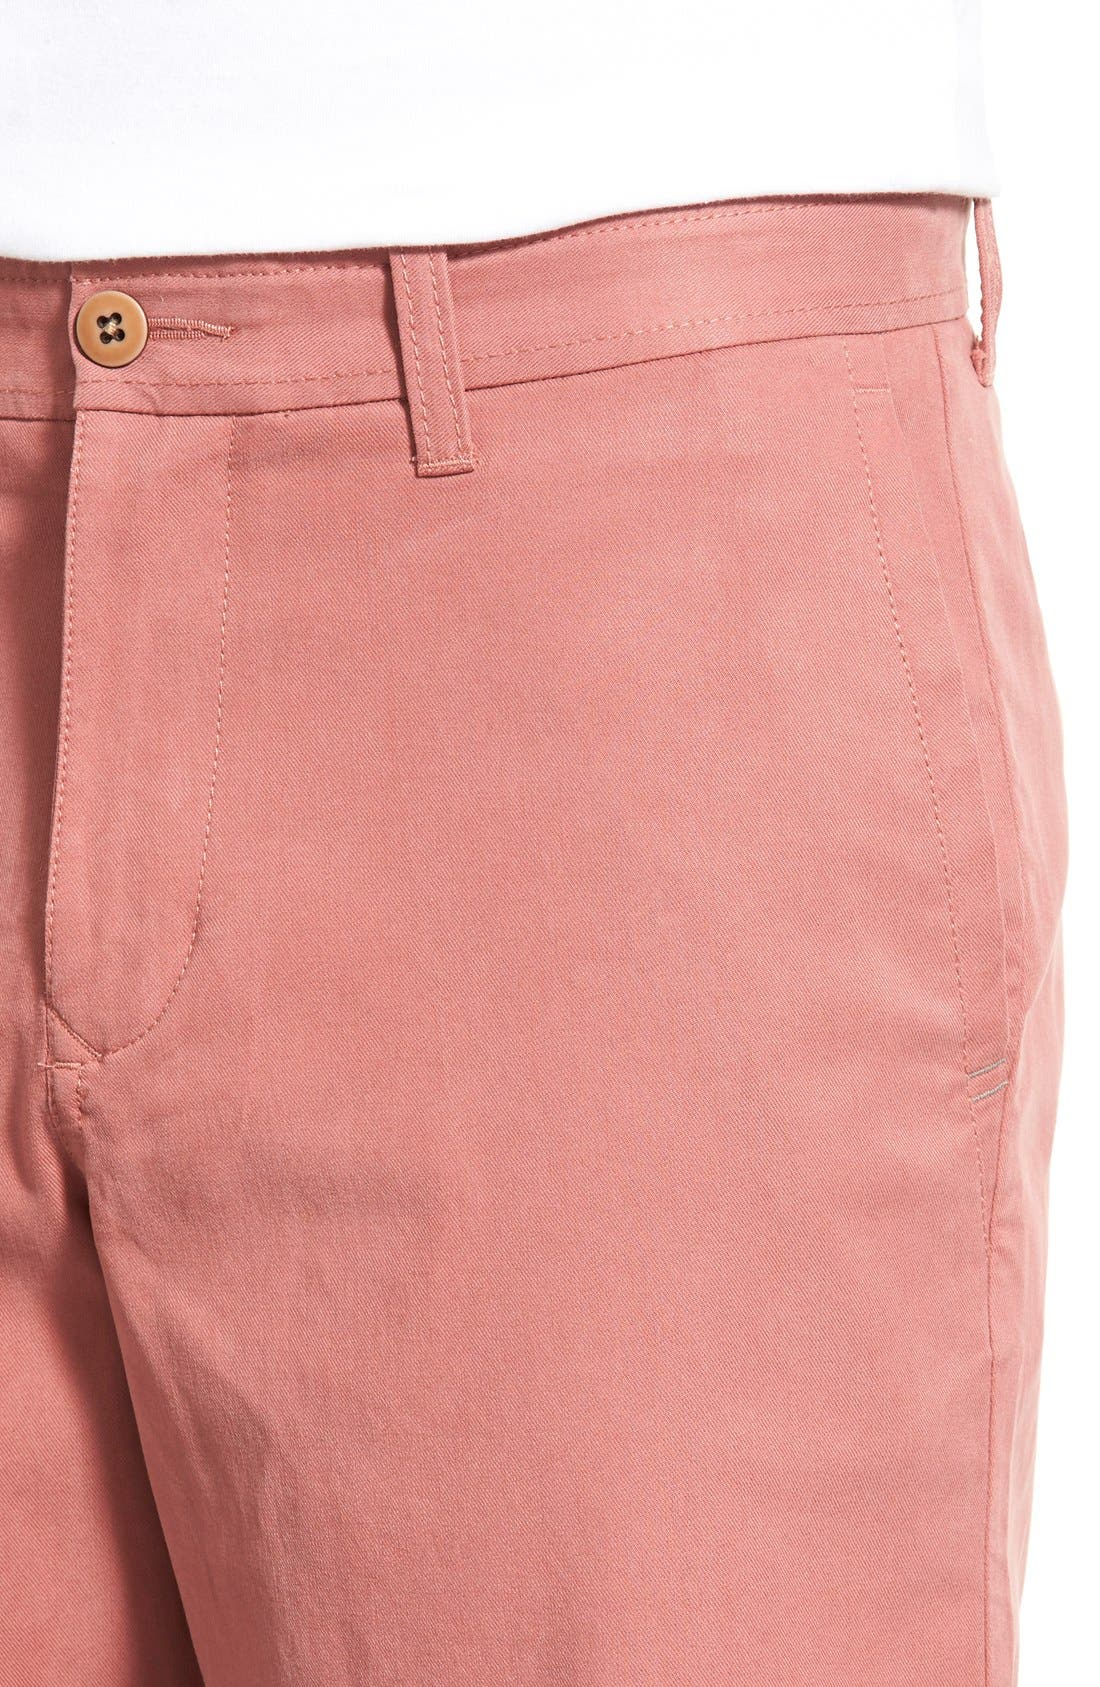 'Offshore' Flat Front Shorts,                             Alternate thumbnail 21, color,